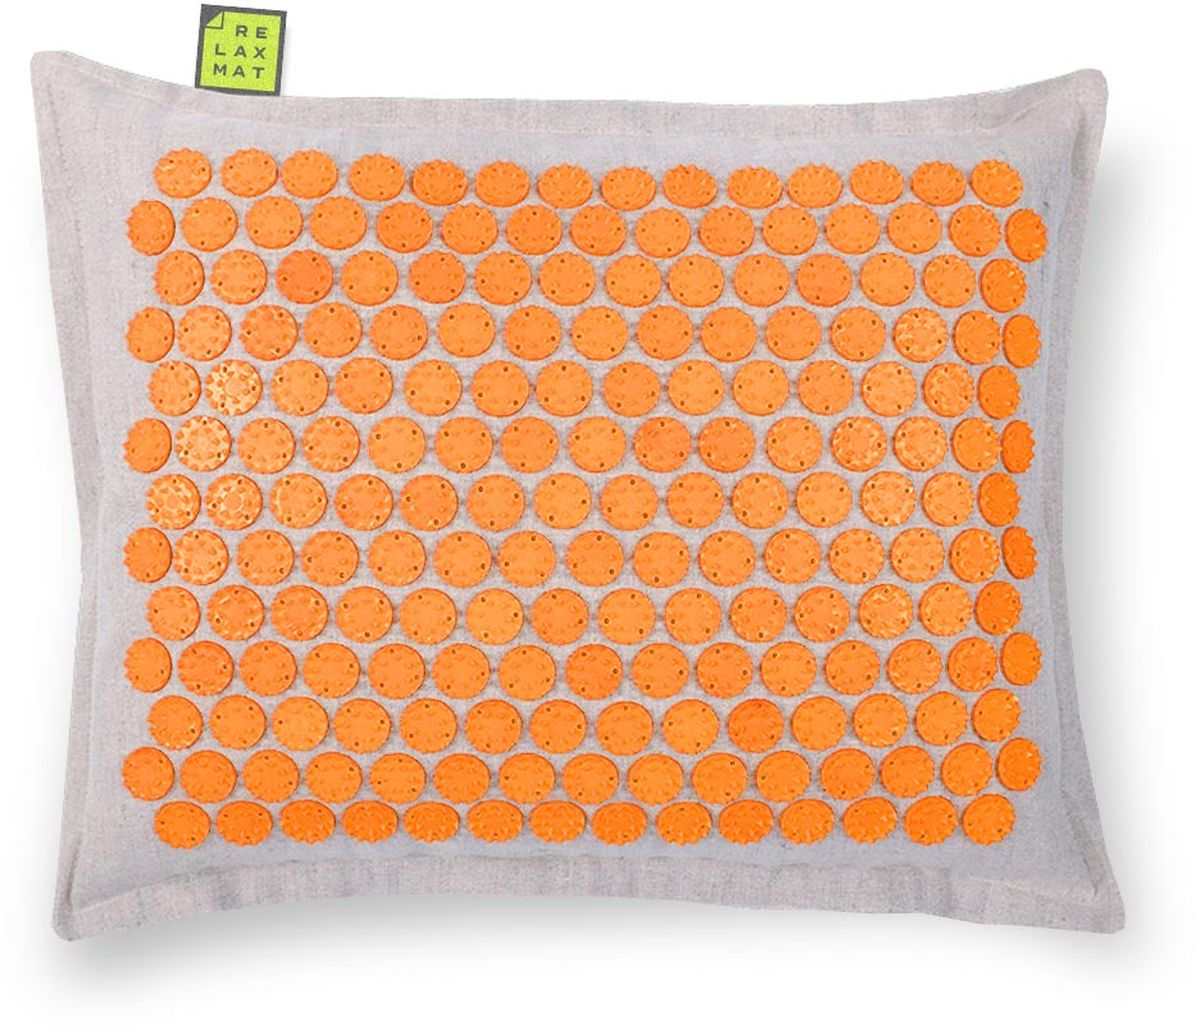 Relaxmat Массажная подушка, цвет: оранжевый